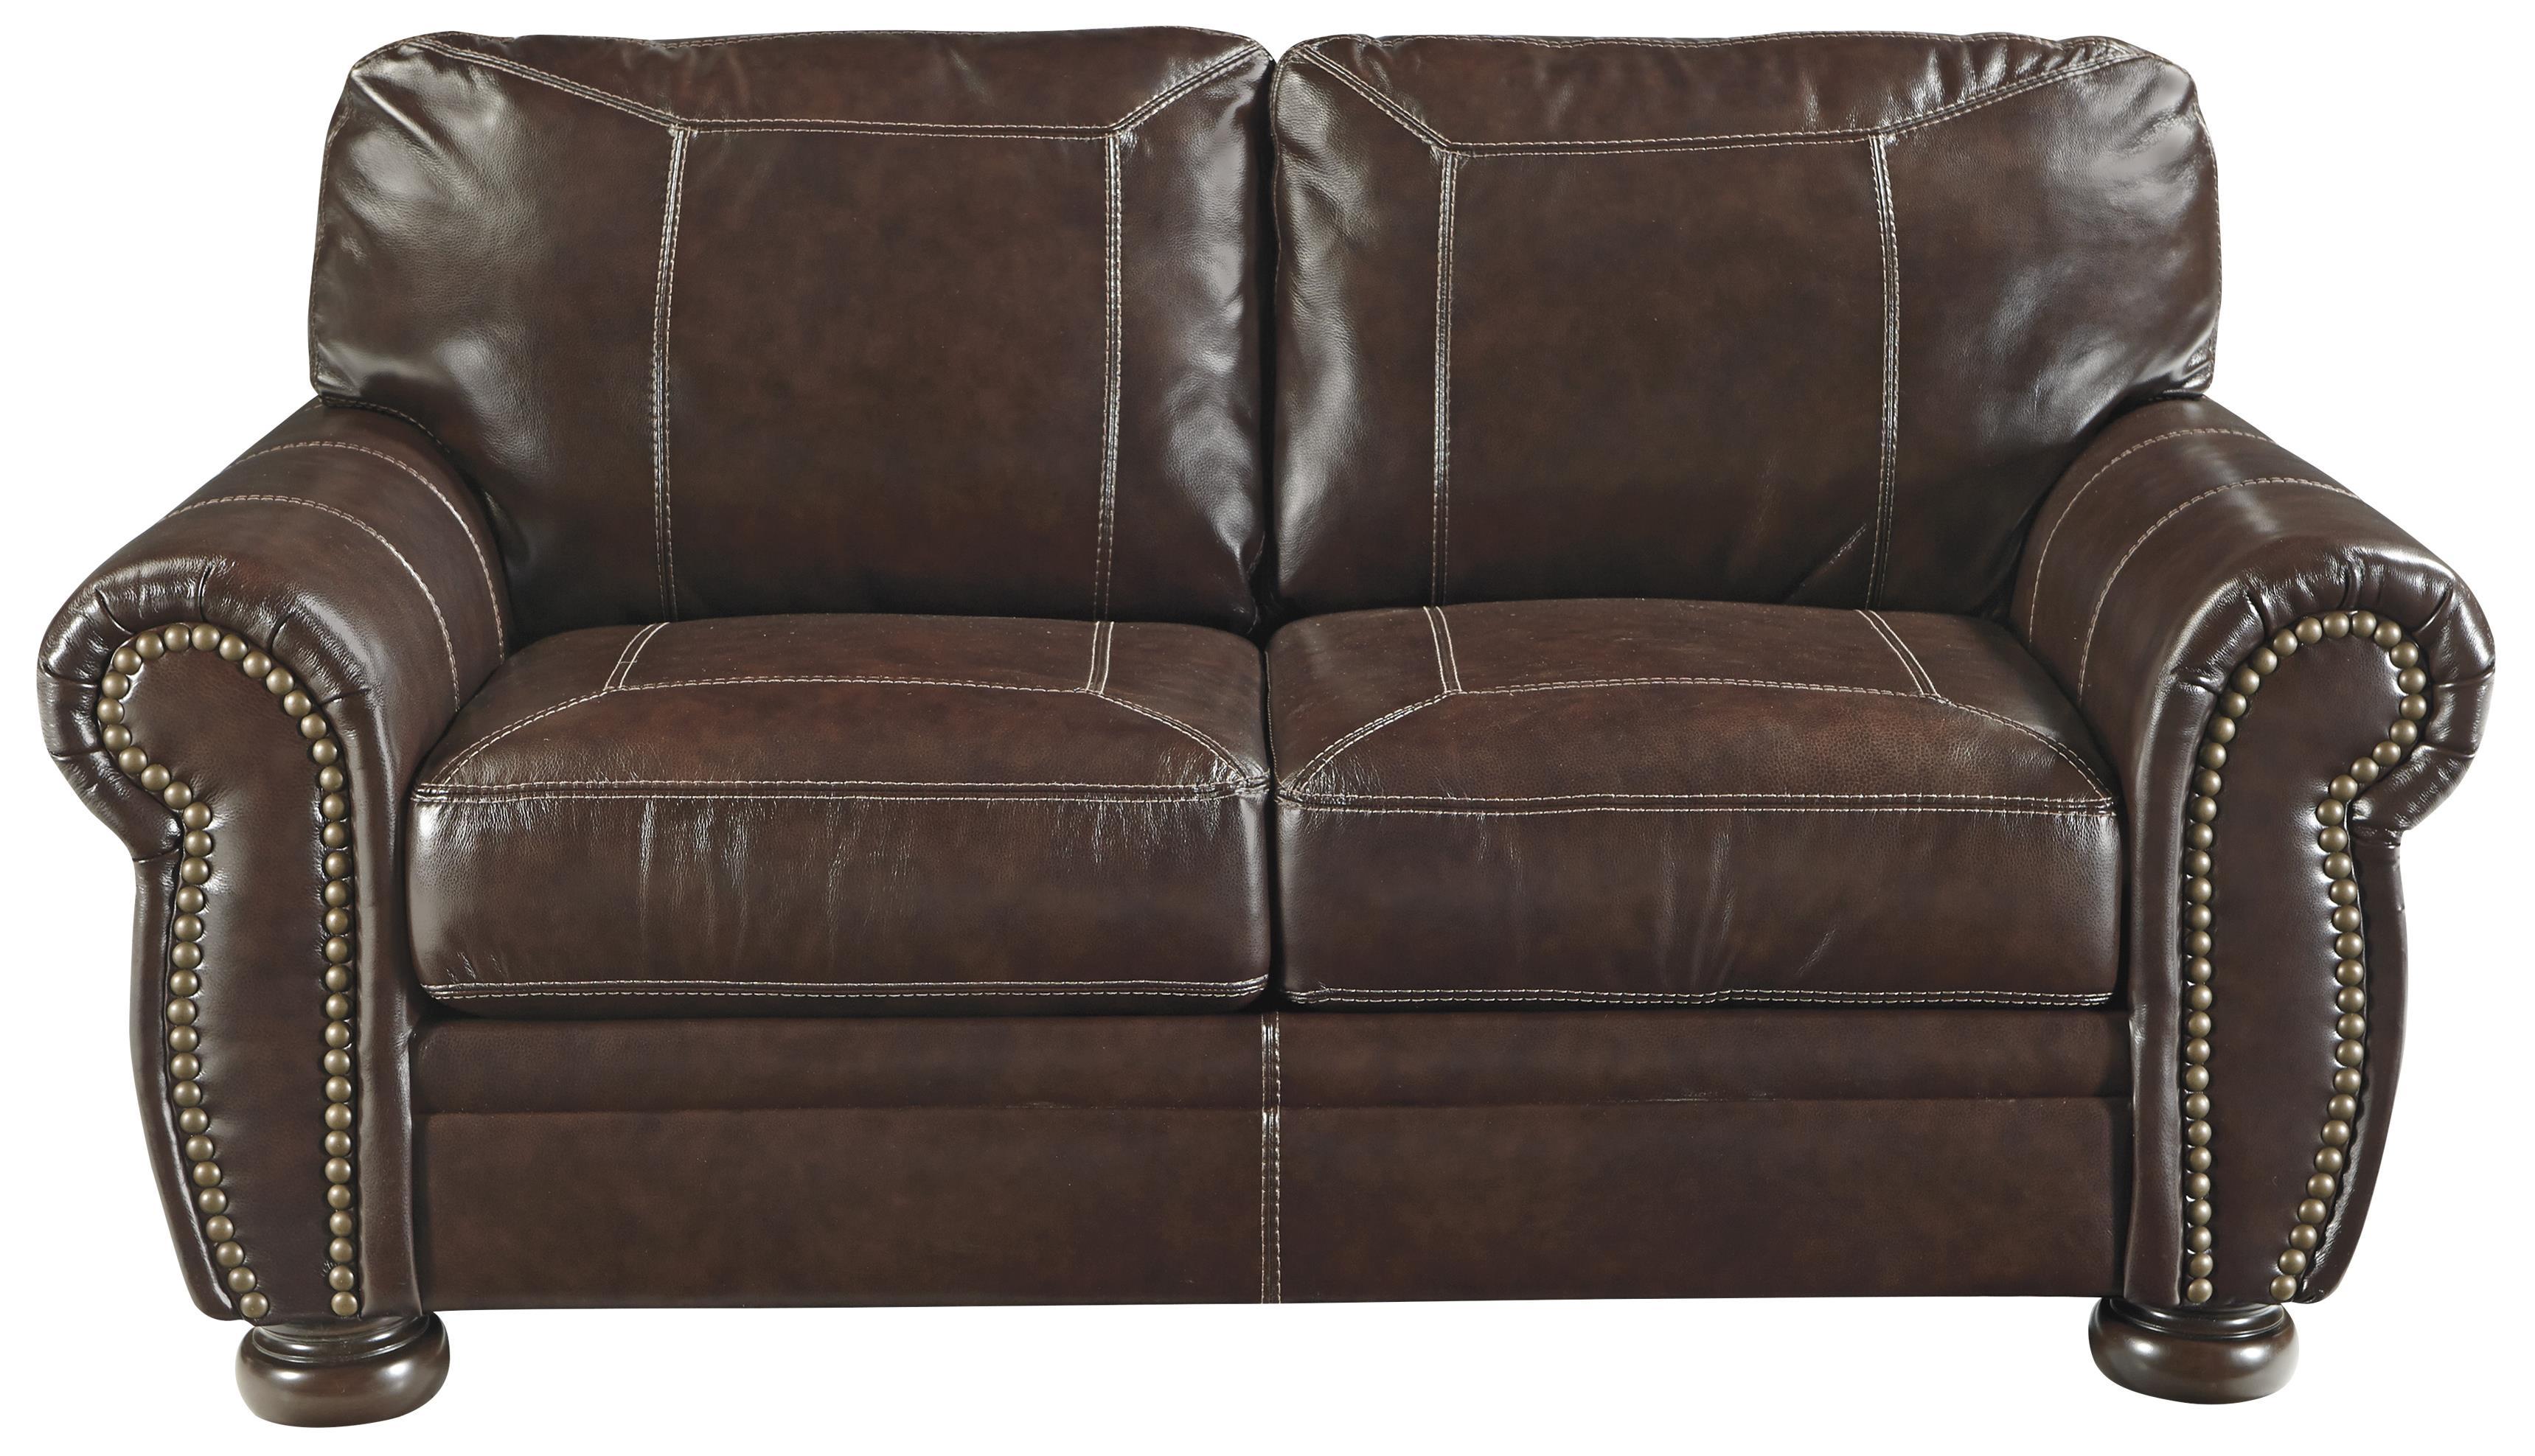 nailhead trim leather sofa set ikea kivik cover uk signature design by ashley banner traditional